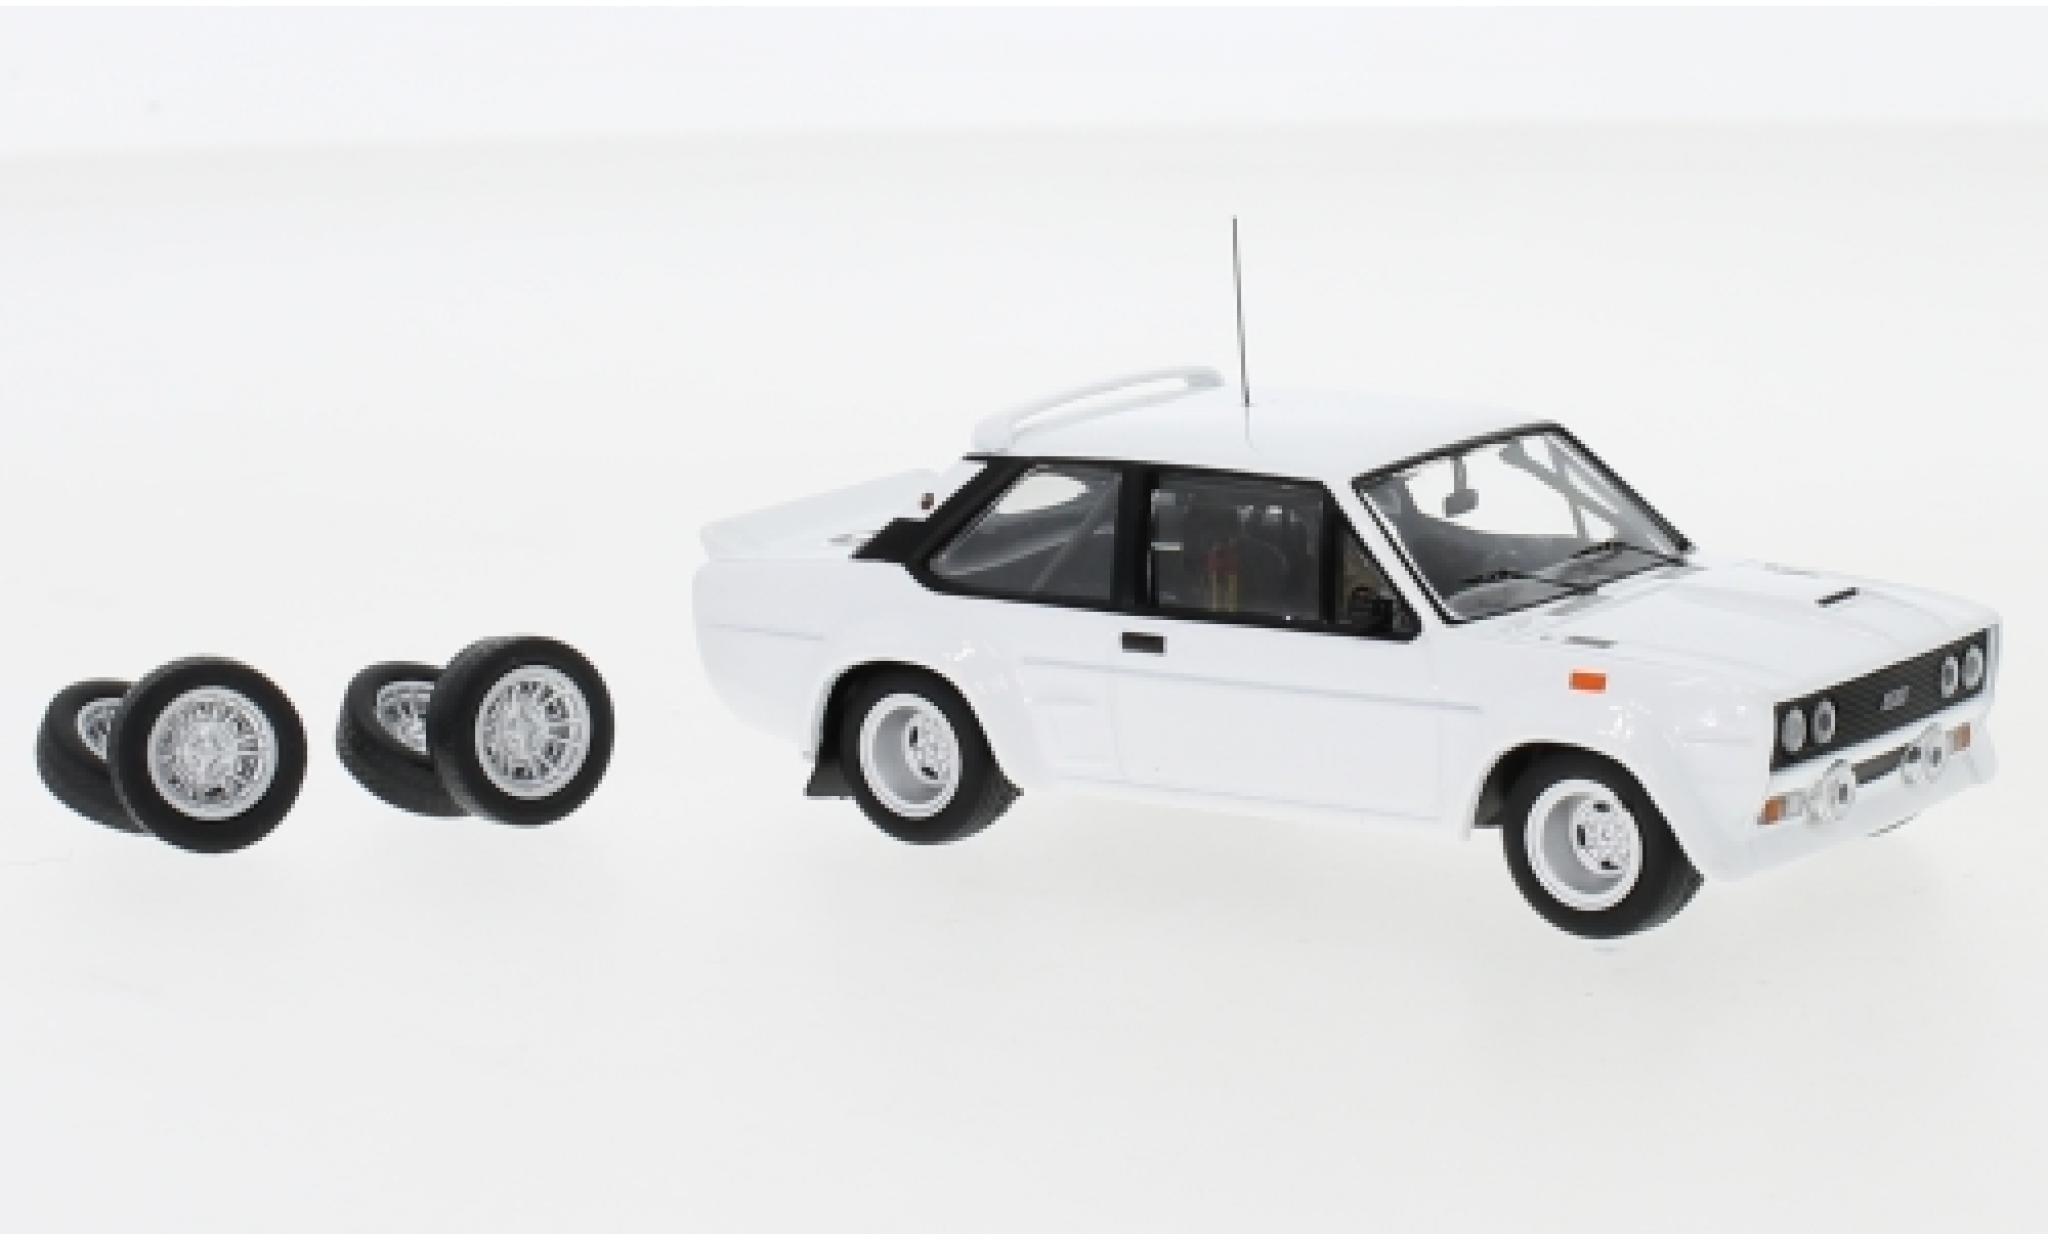 Fiat 131 1/43 IXO Abarth blanche 1978 Plain Body Version y compris les Zusatzteile